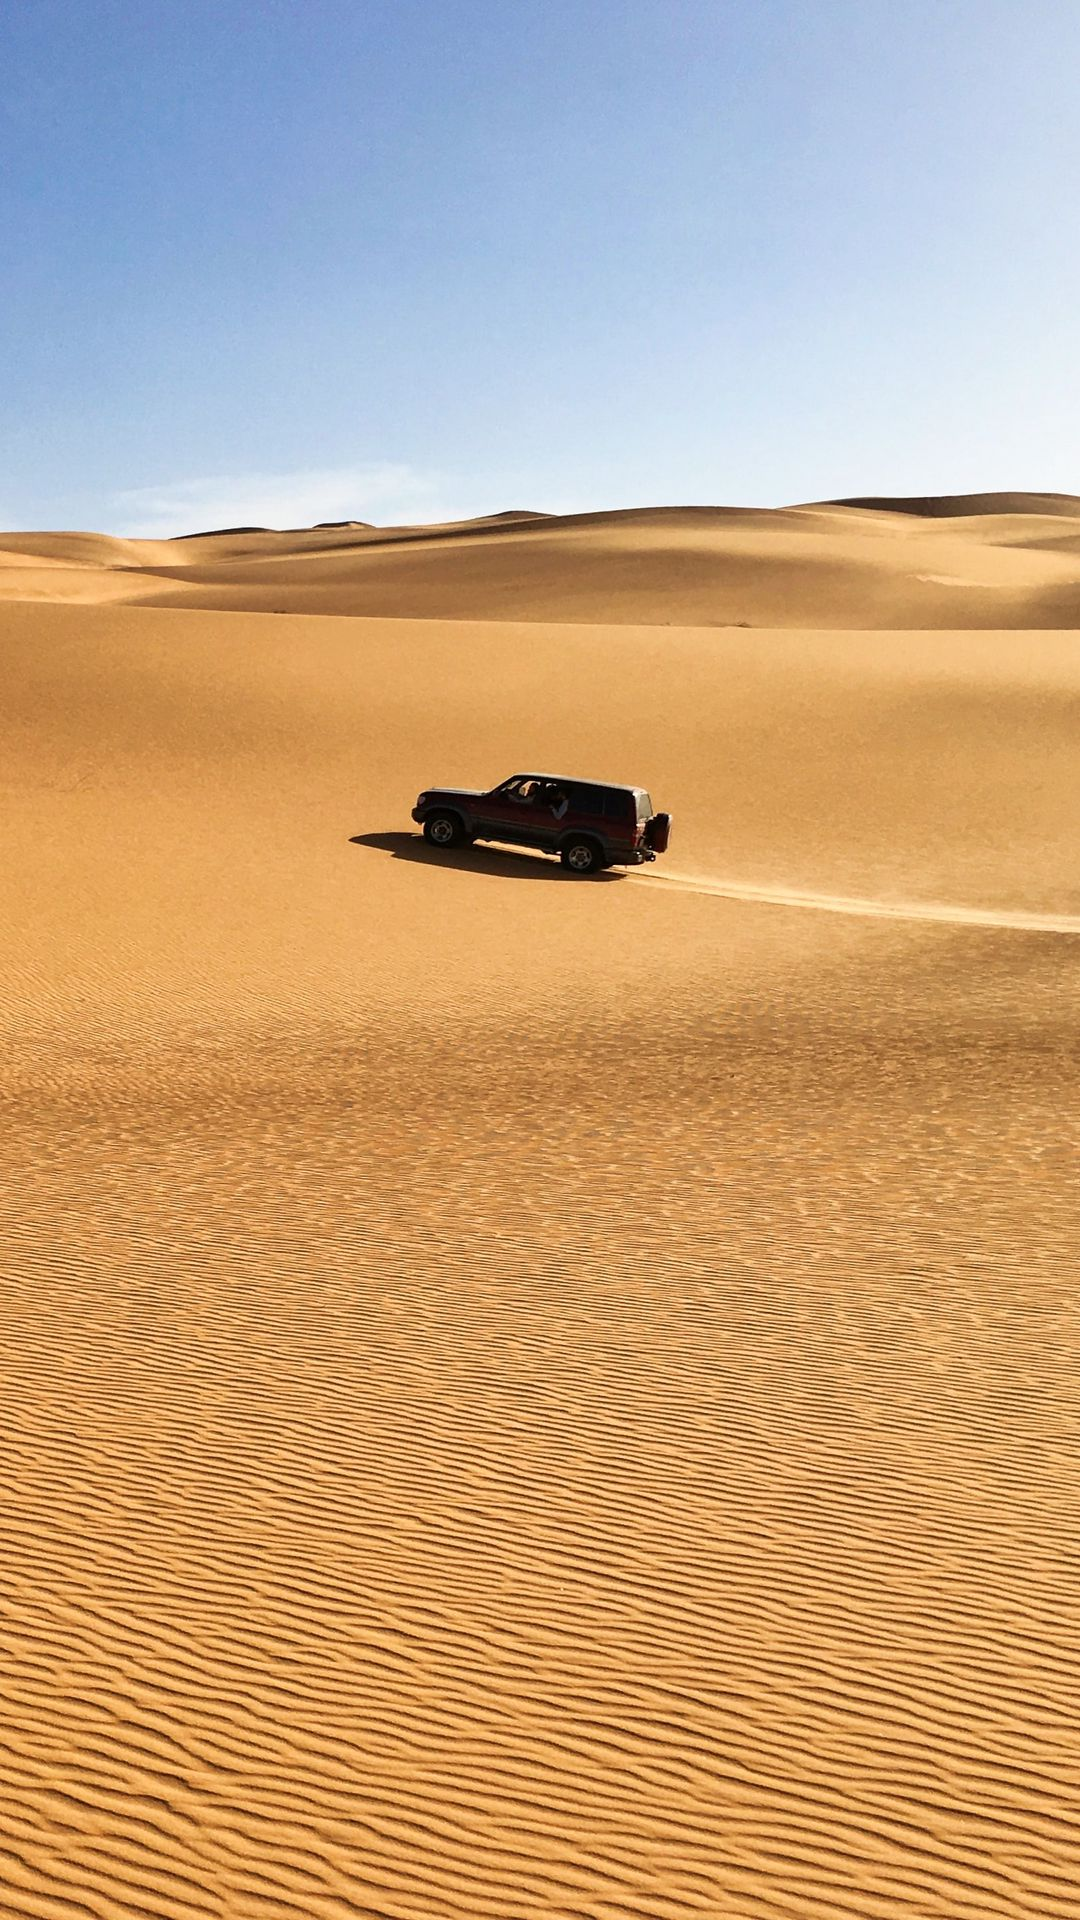 Wallpaper Jeep Car Desert Sand Blue Sky